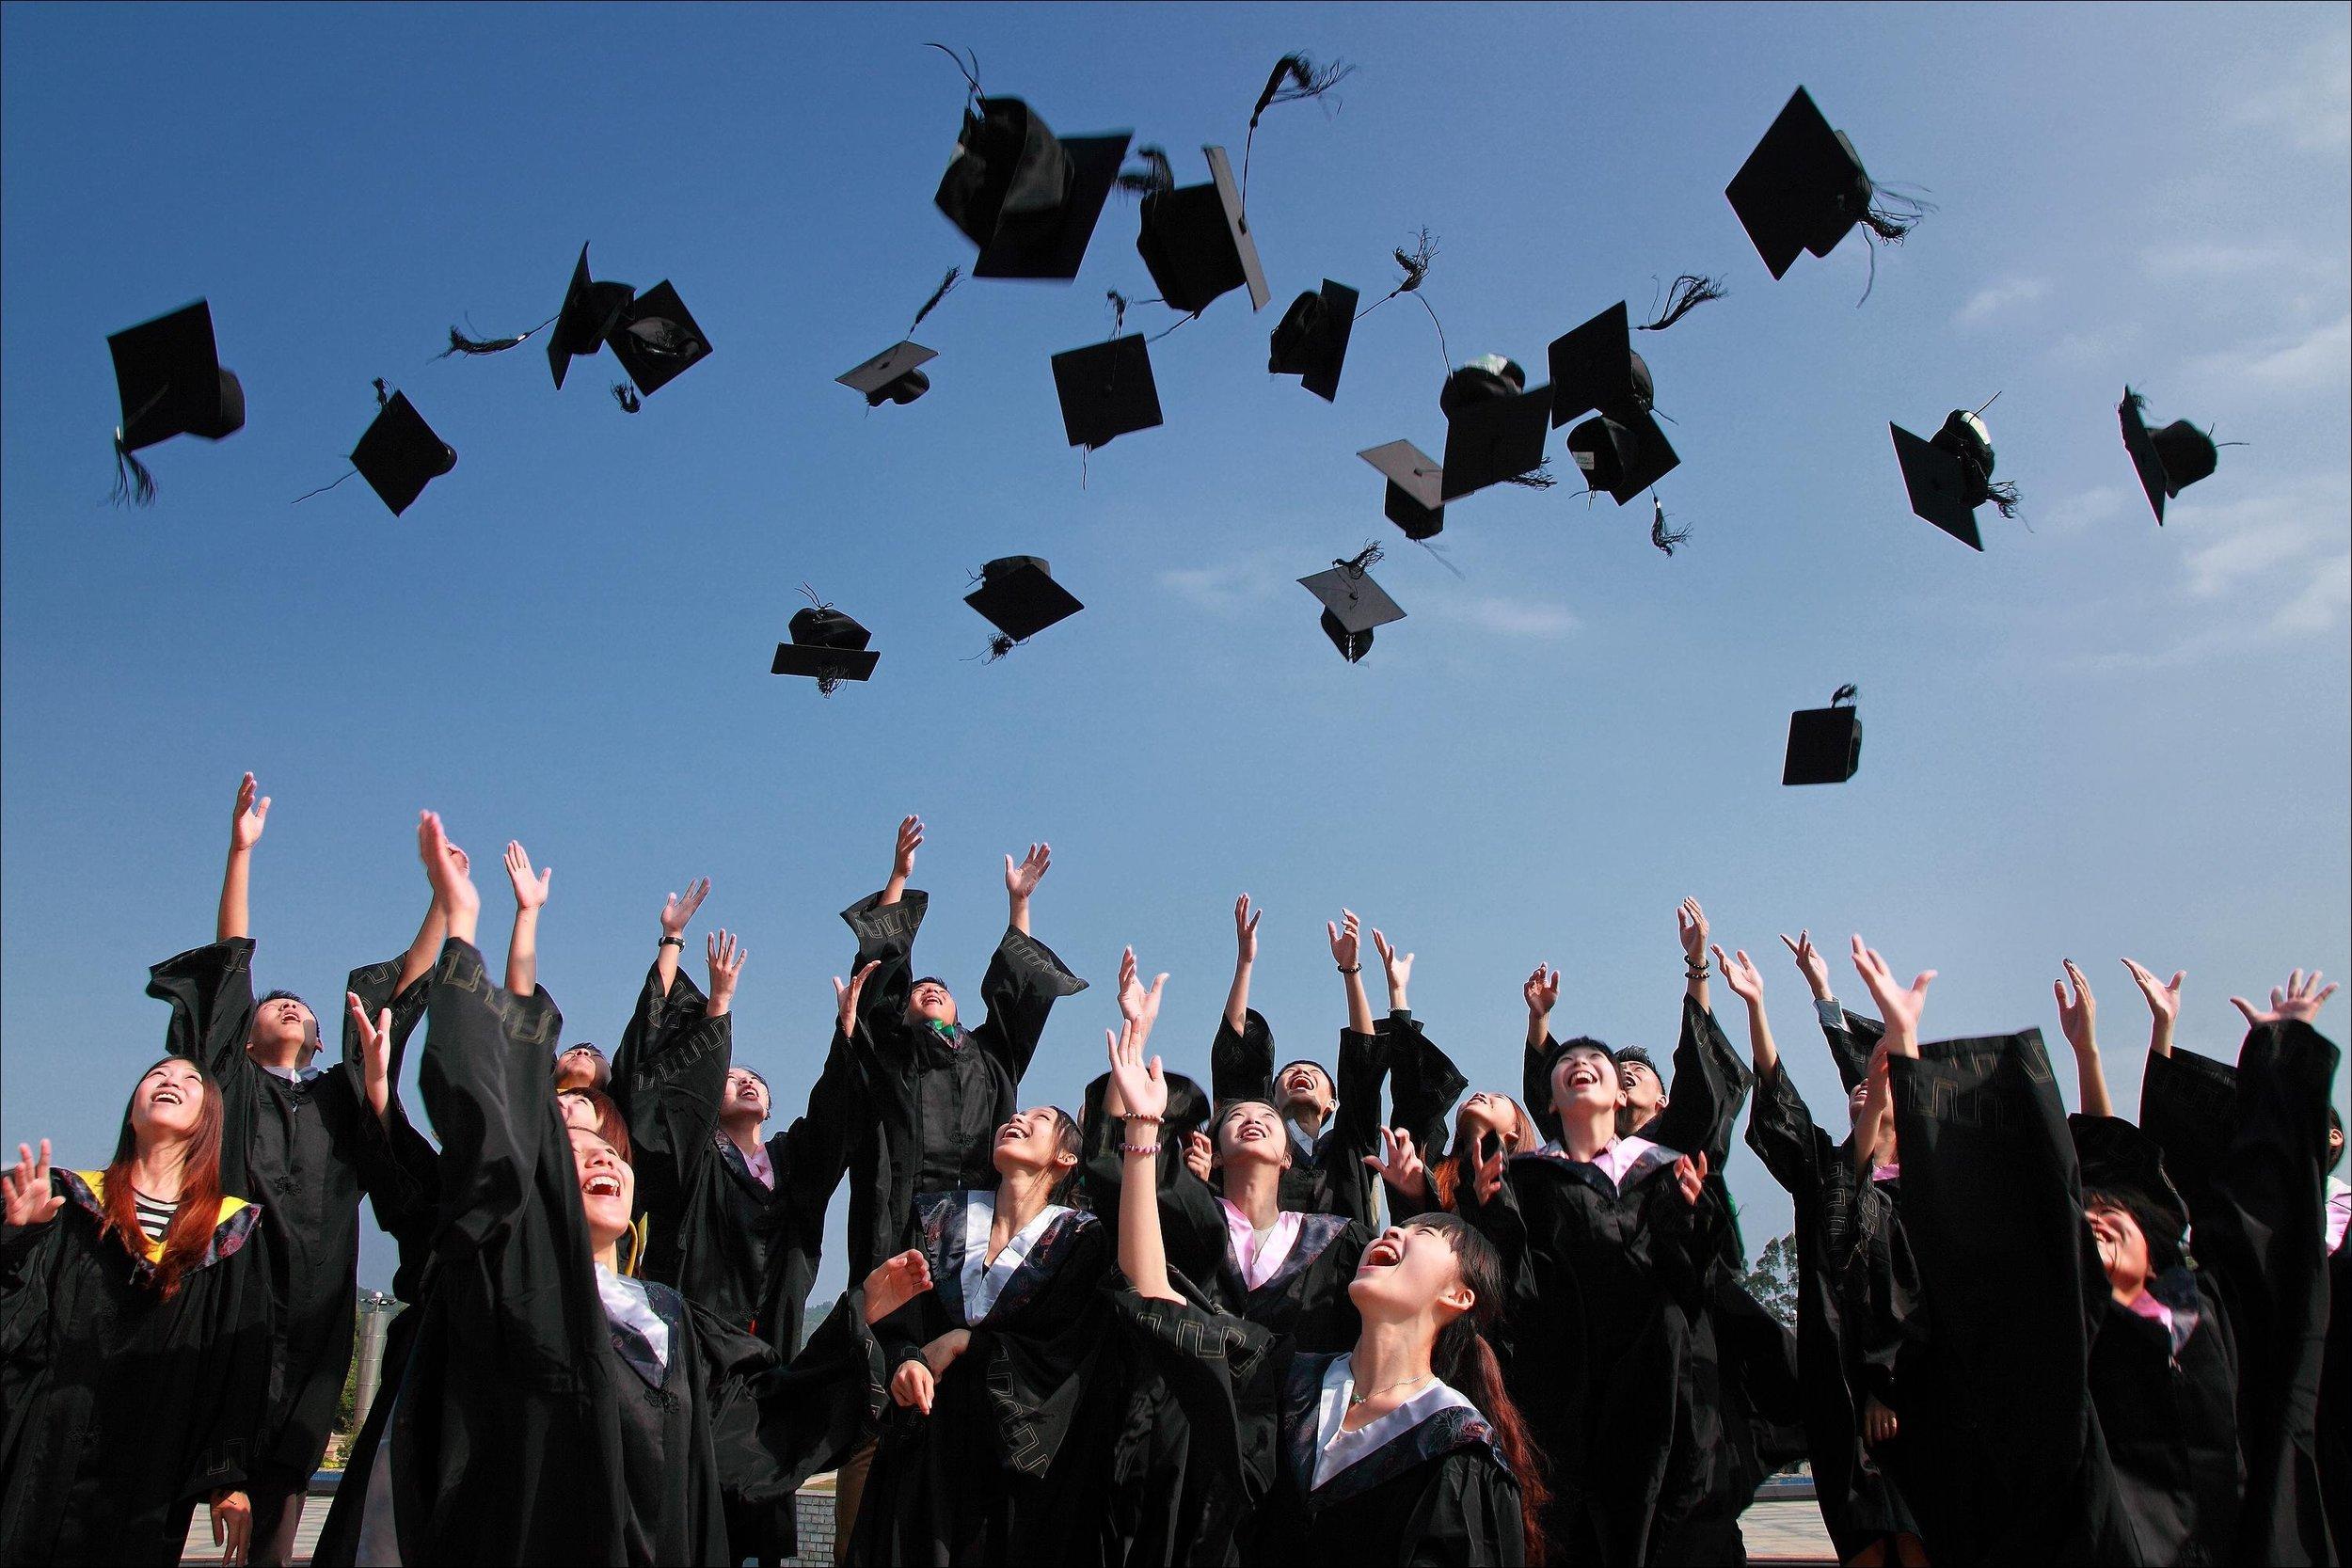 Research how your schools judge applicants!